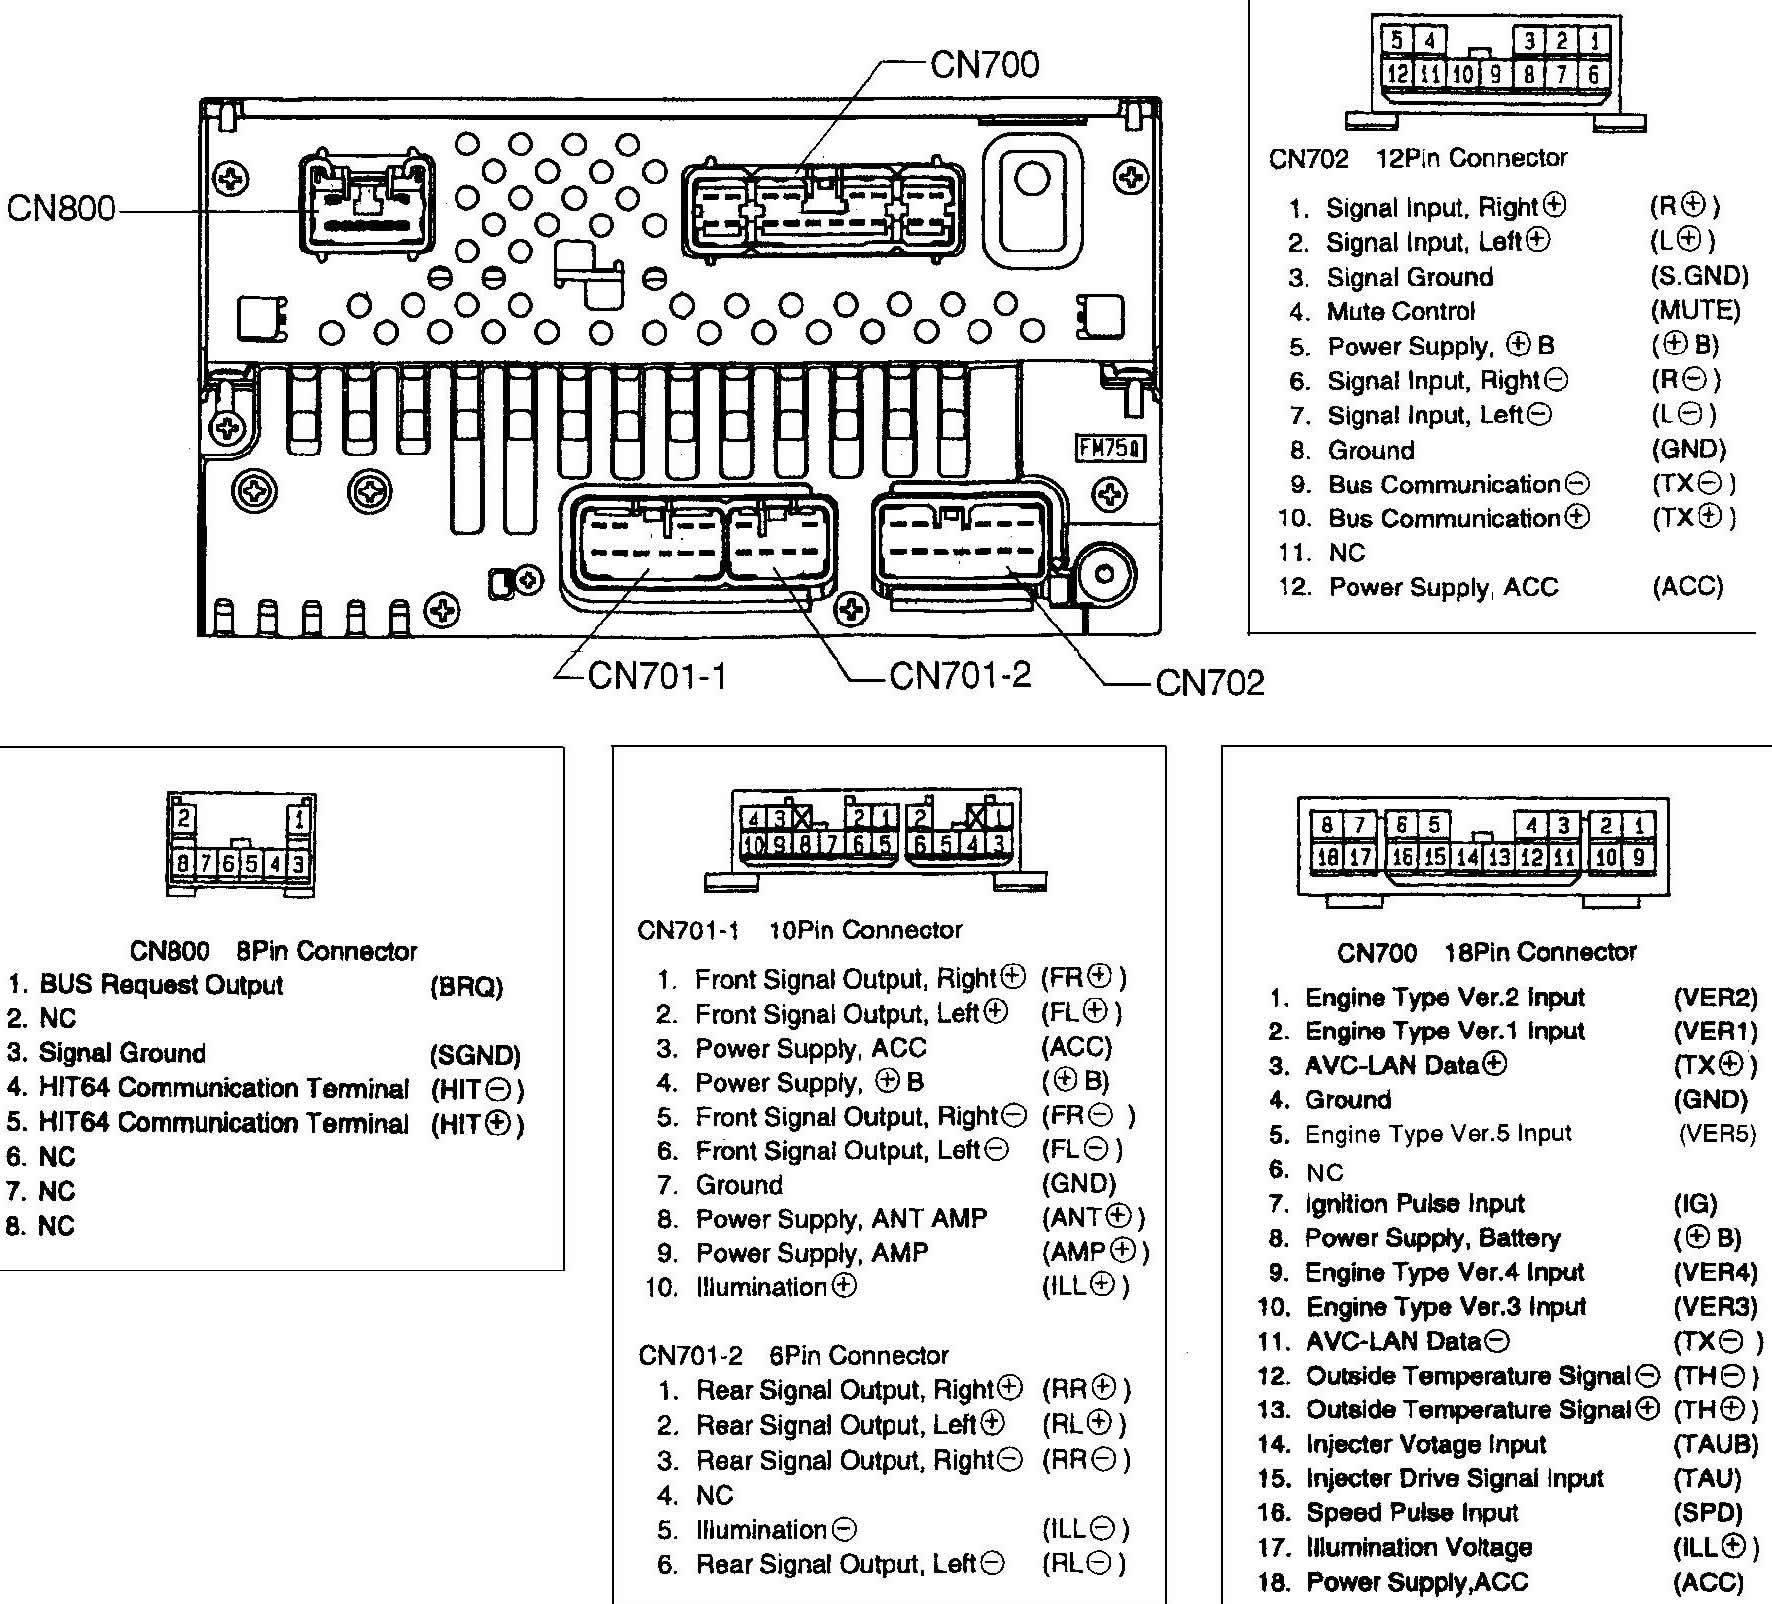 Toyota Radio | anschluss, carhifi, hifi, radio, toyota, verkabelung ...